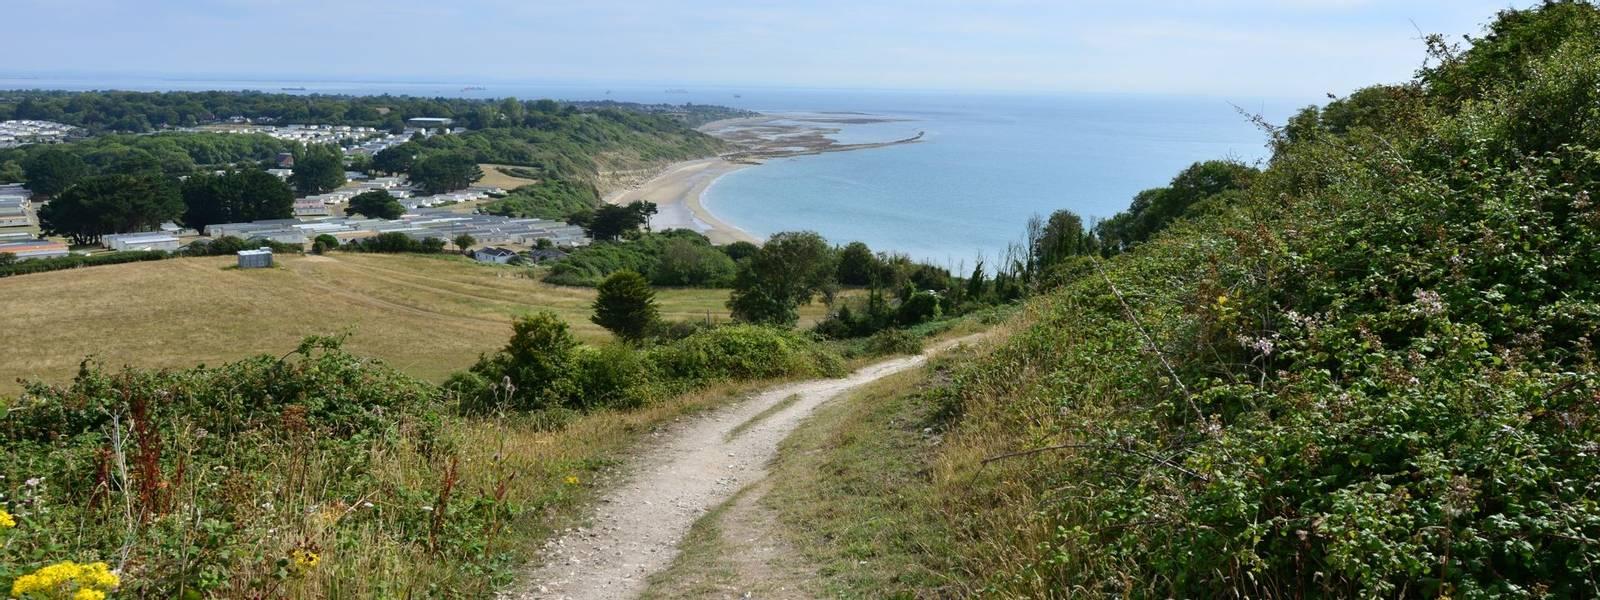 Isle_of_Wight_Coast_AdobeStock_366936226.jpeg